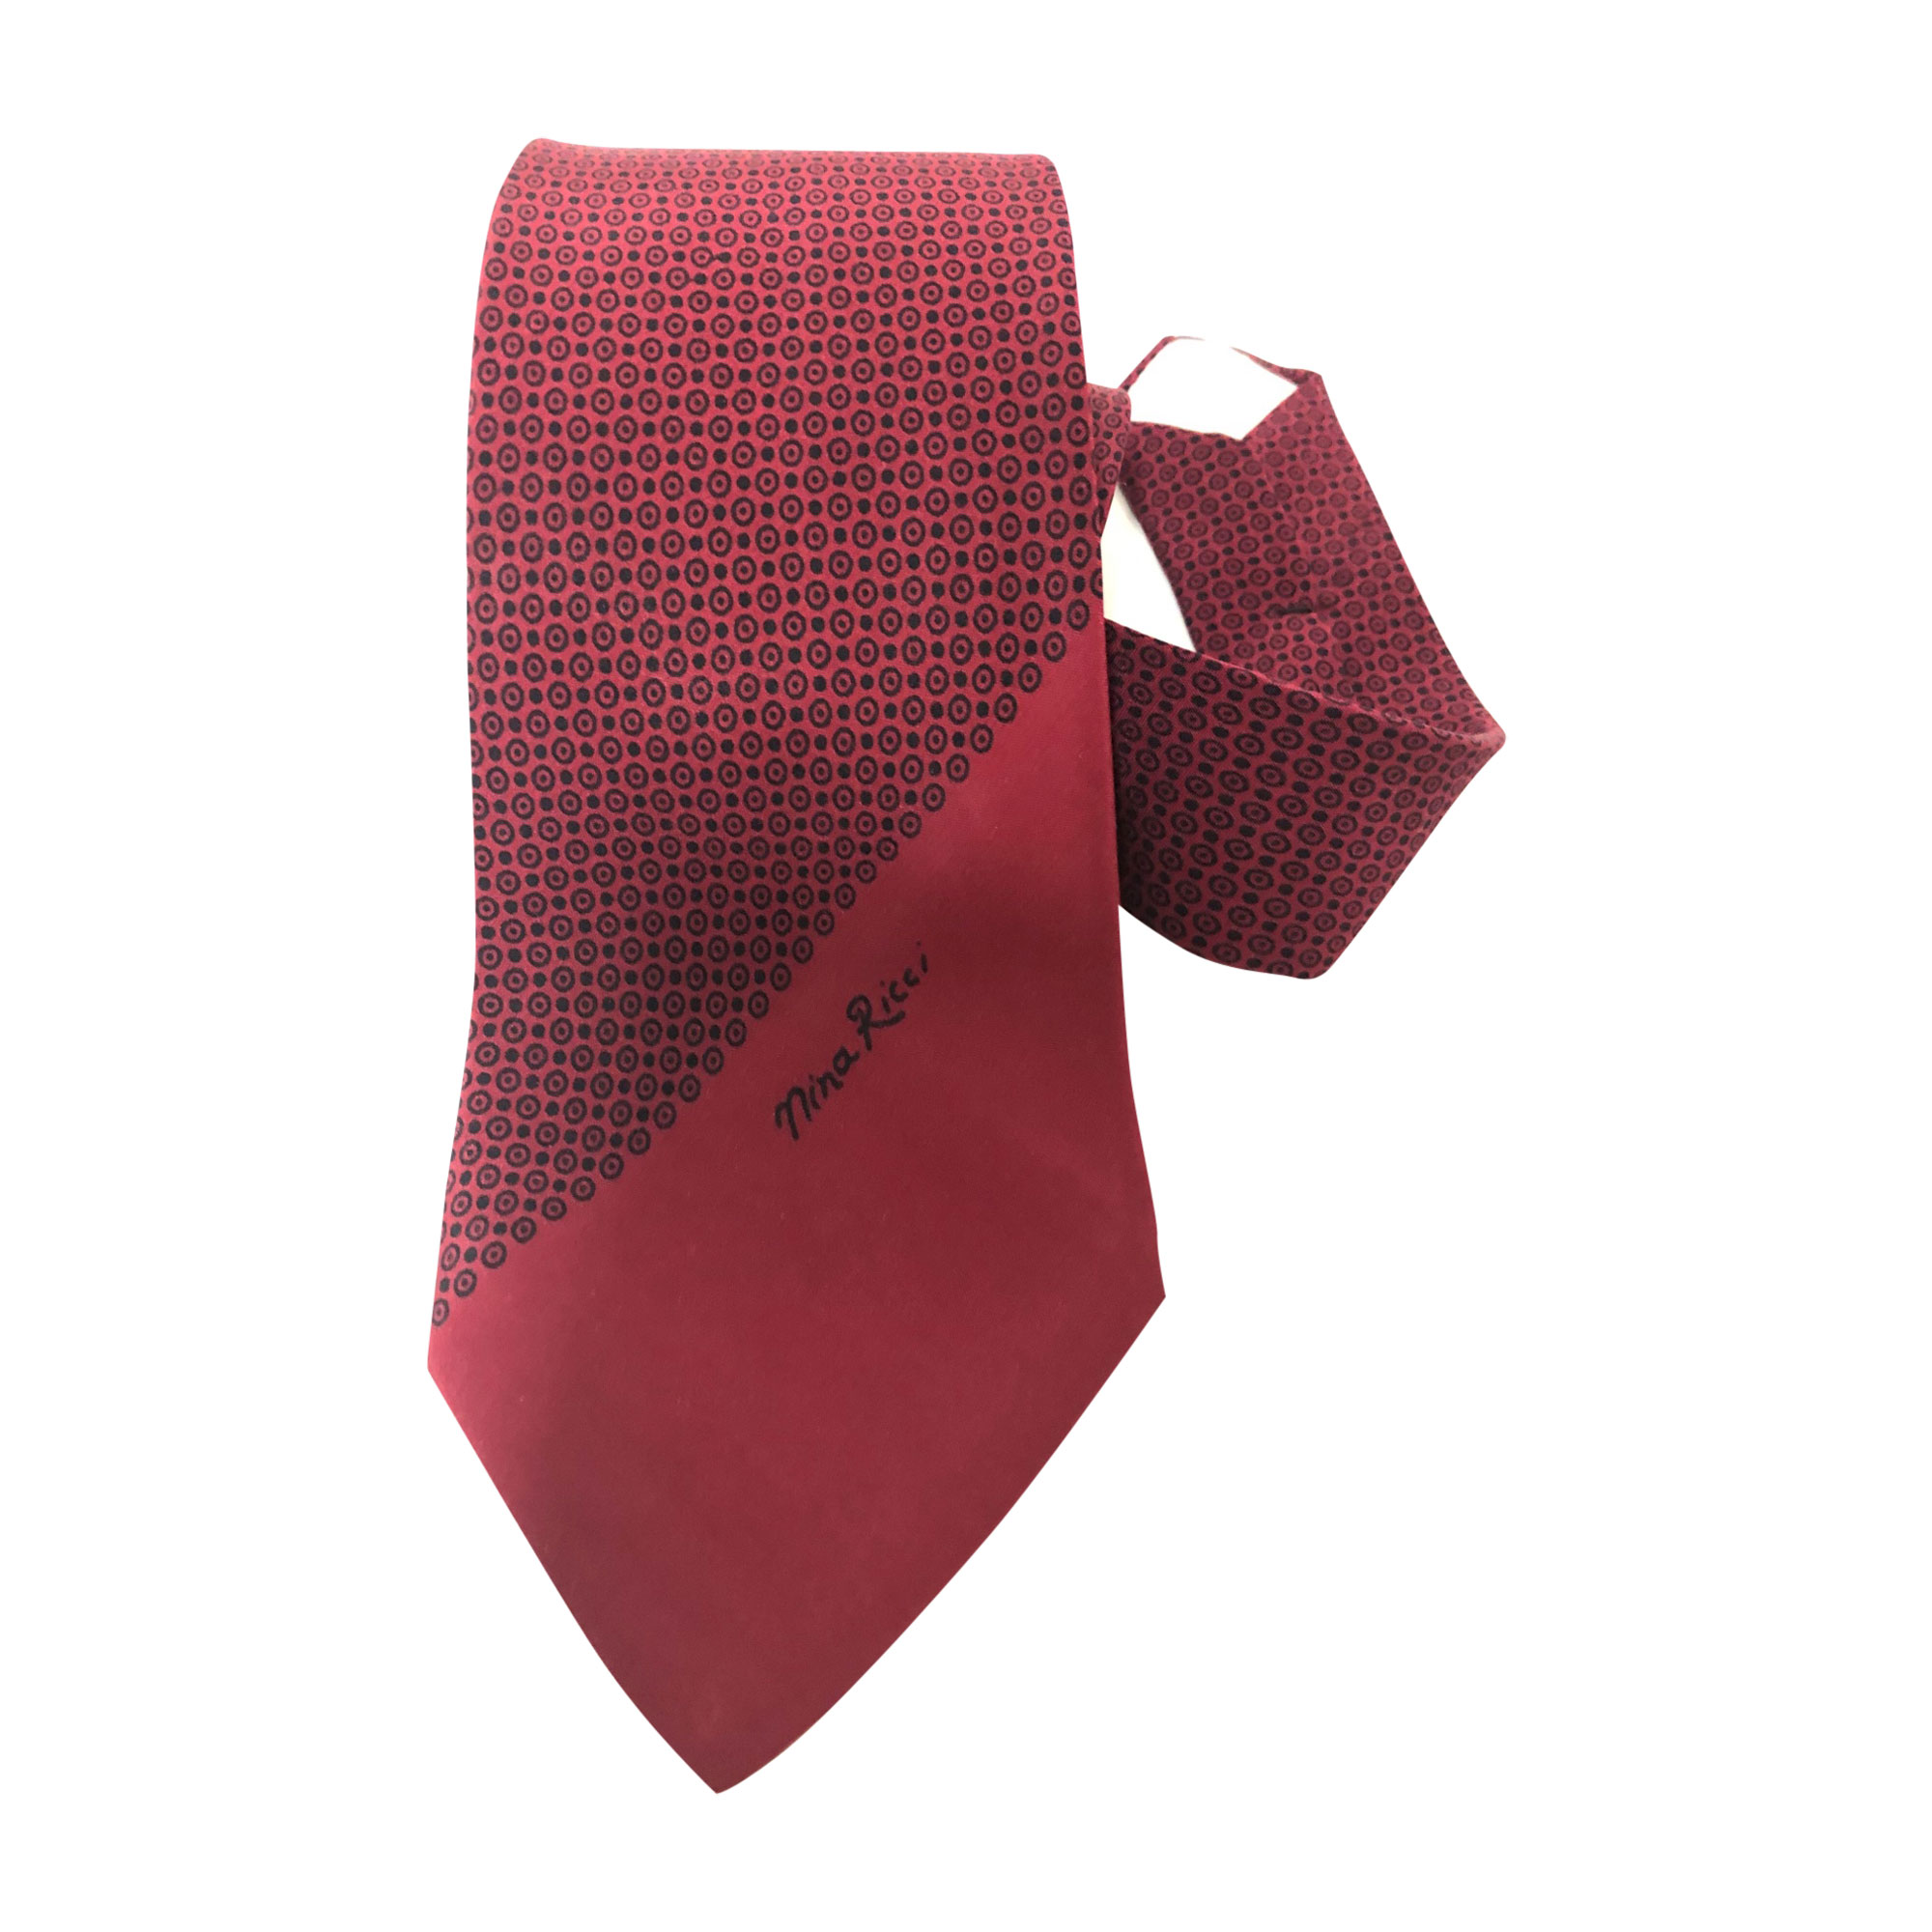 Krawatte NINA RICCI Rot, bordeauxrot